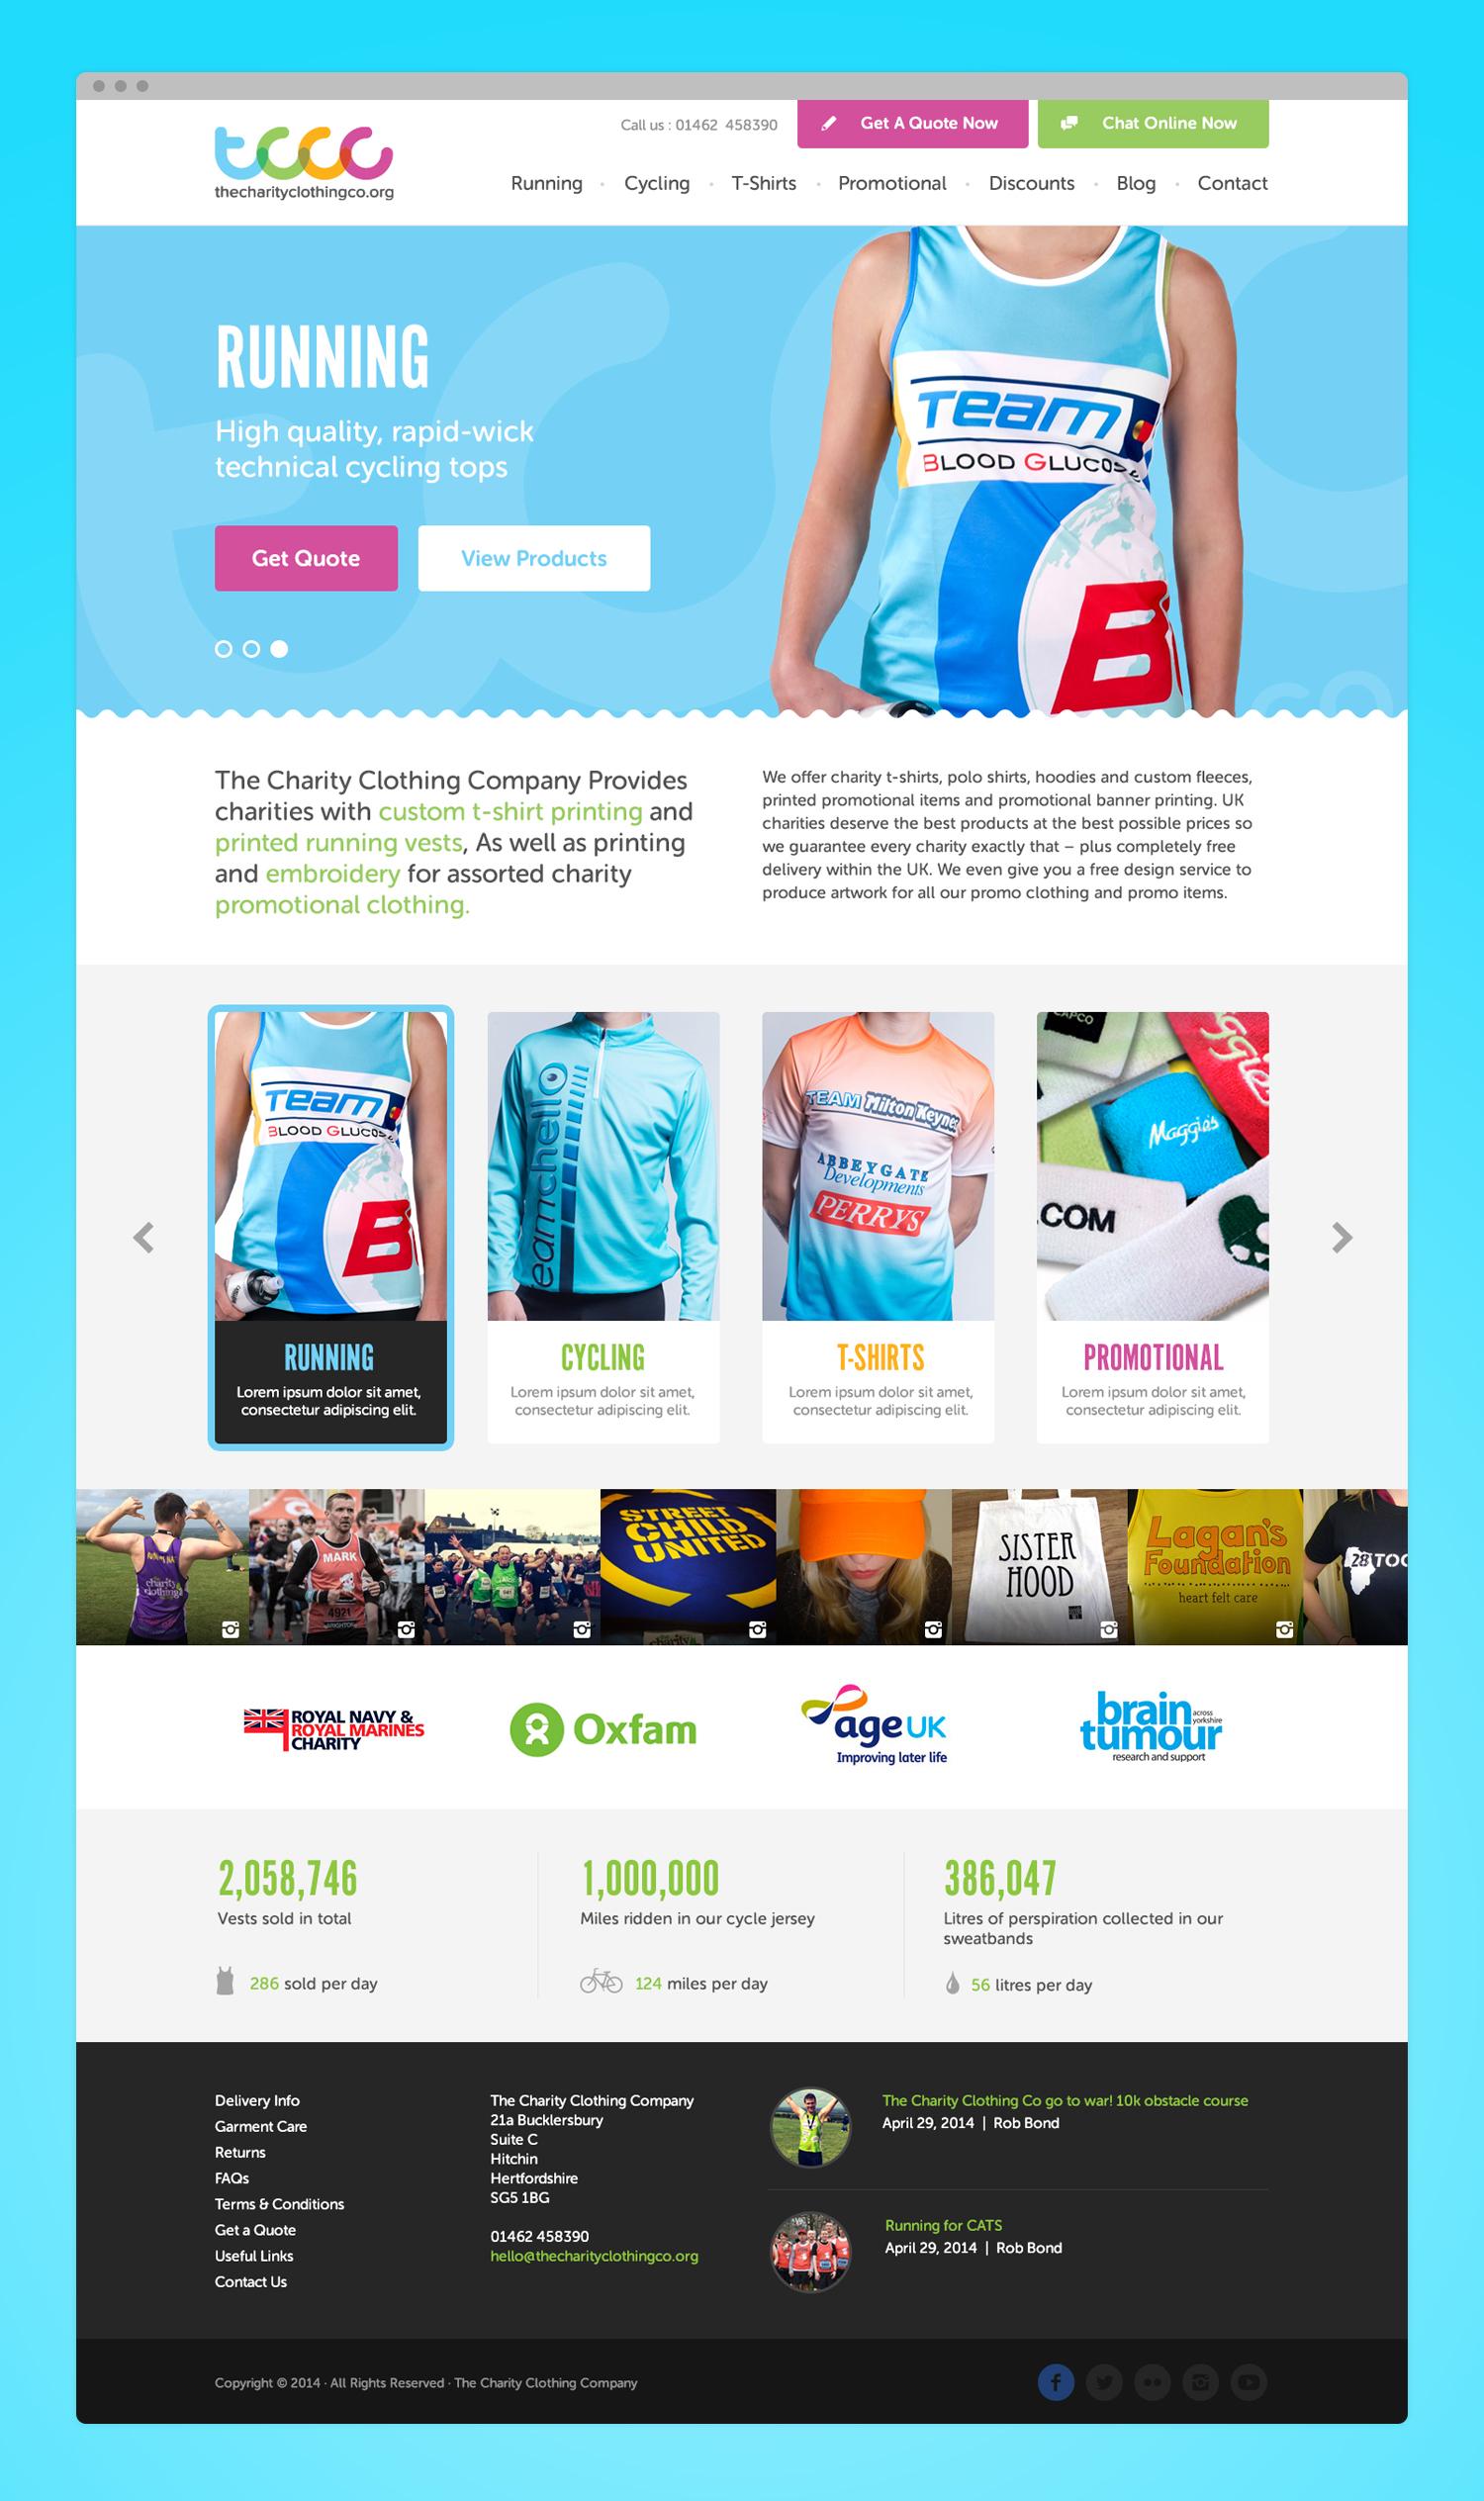 charityclothingcompany website design